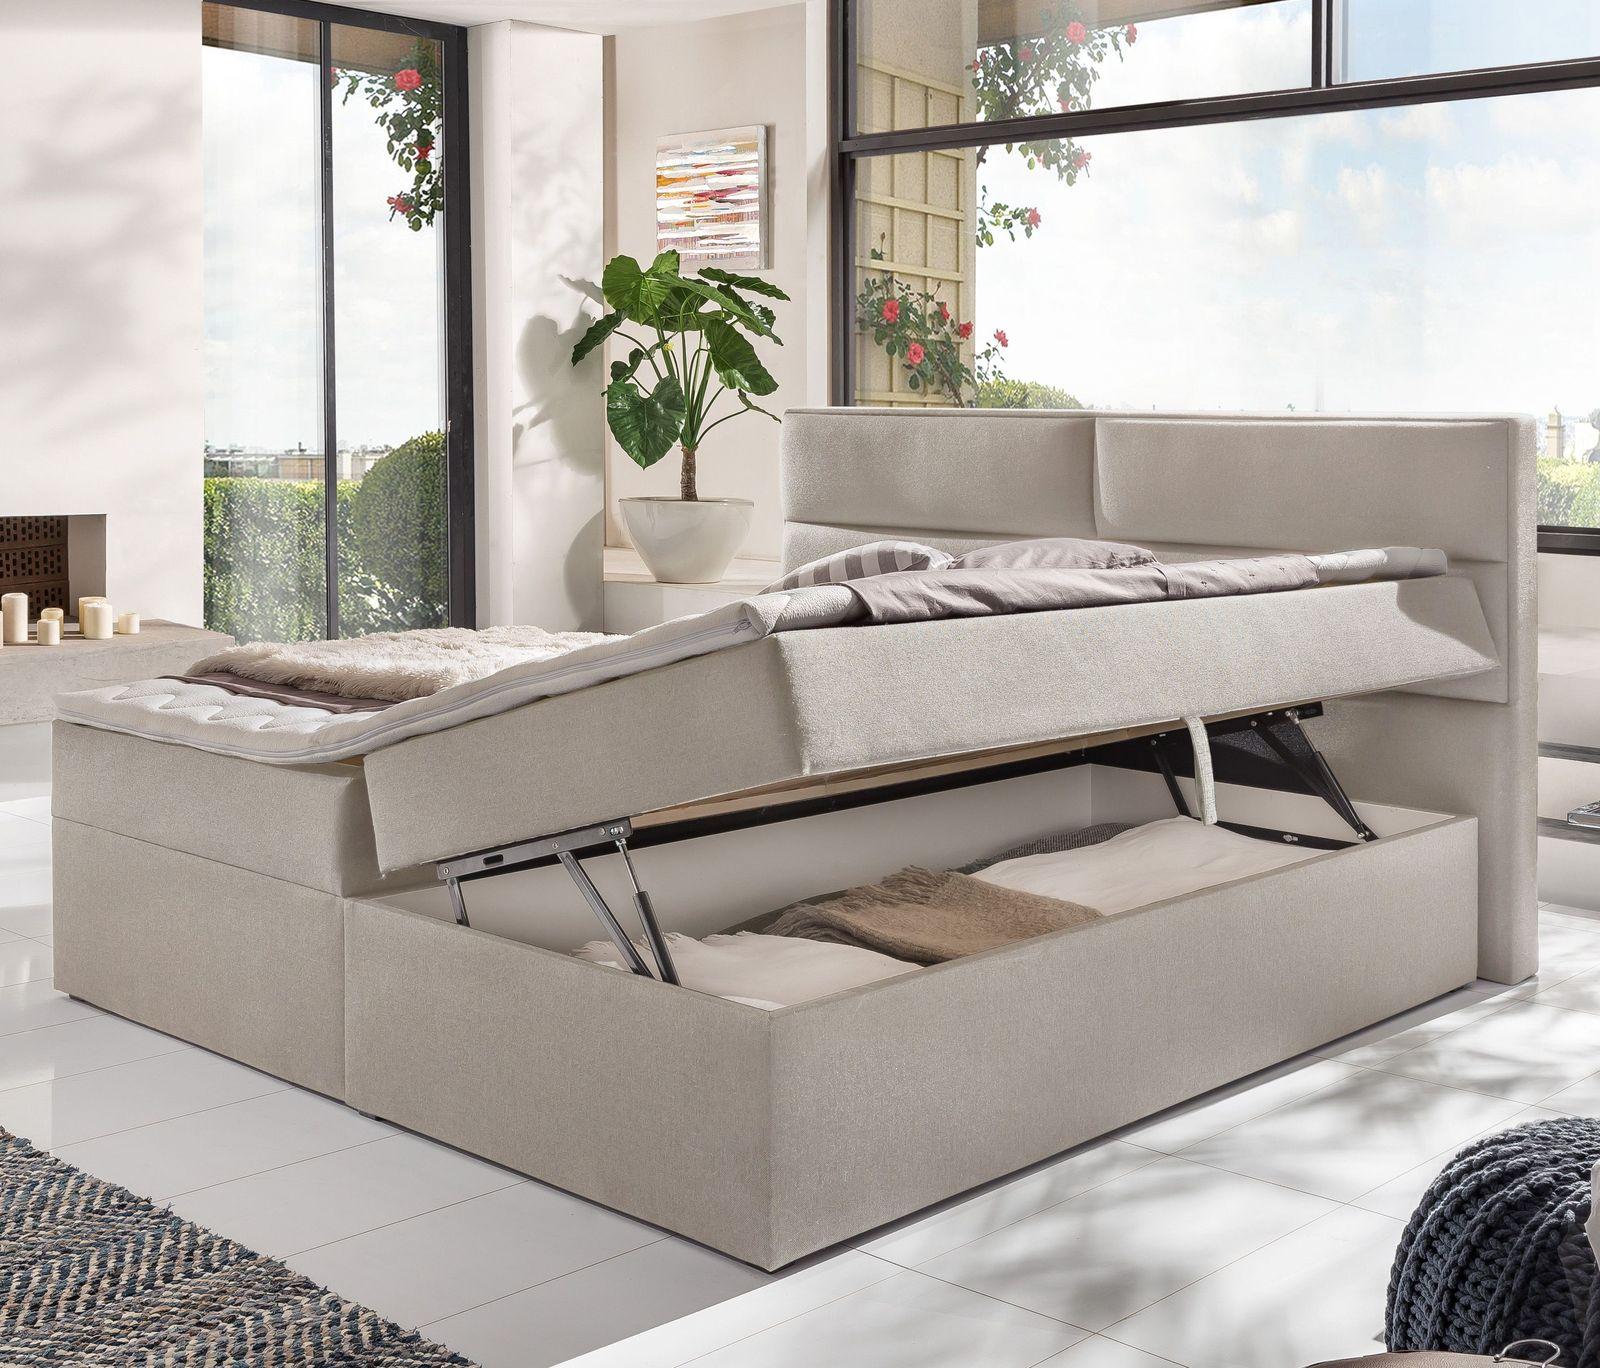 stoff boxbett 180x200 cm inklusive matratzen topper belcastro. Black Bedroom Furniture Sets. Home Design Ideas